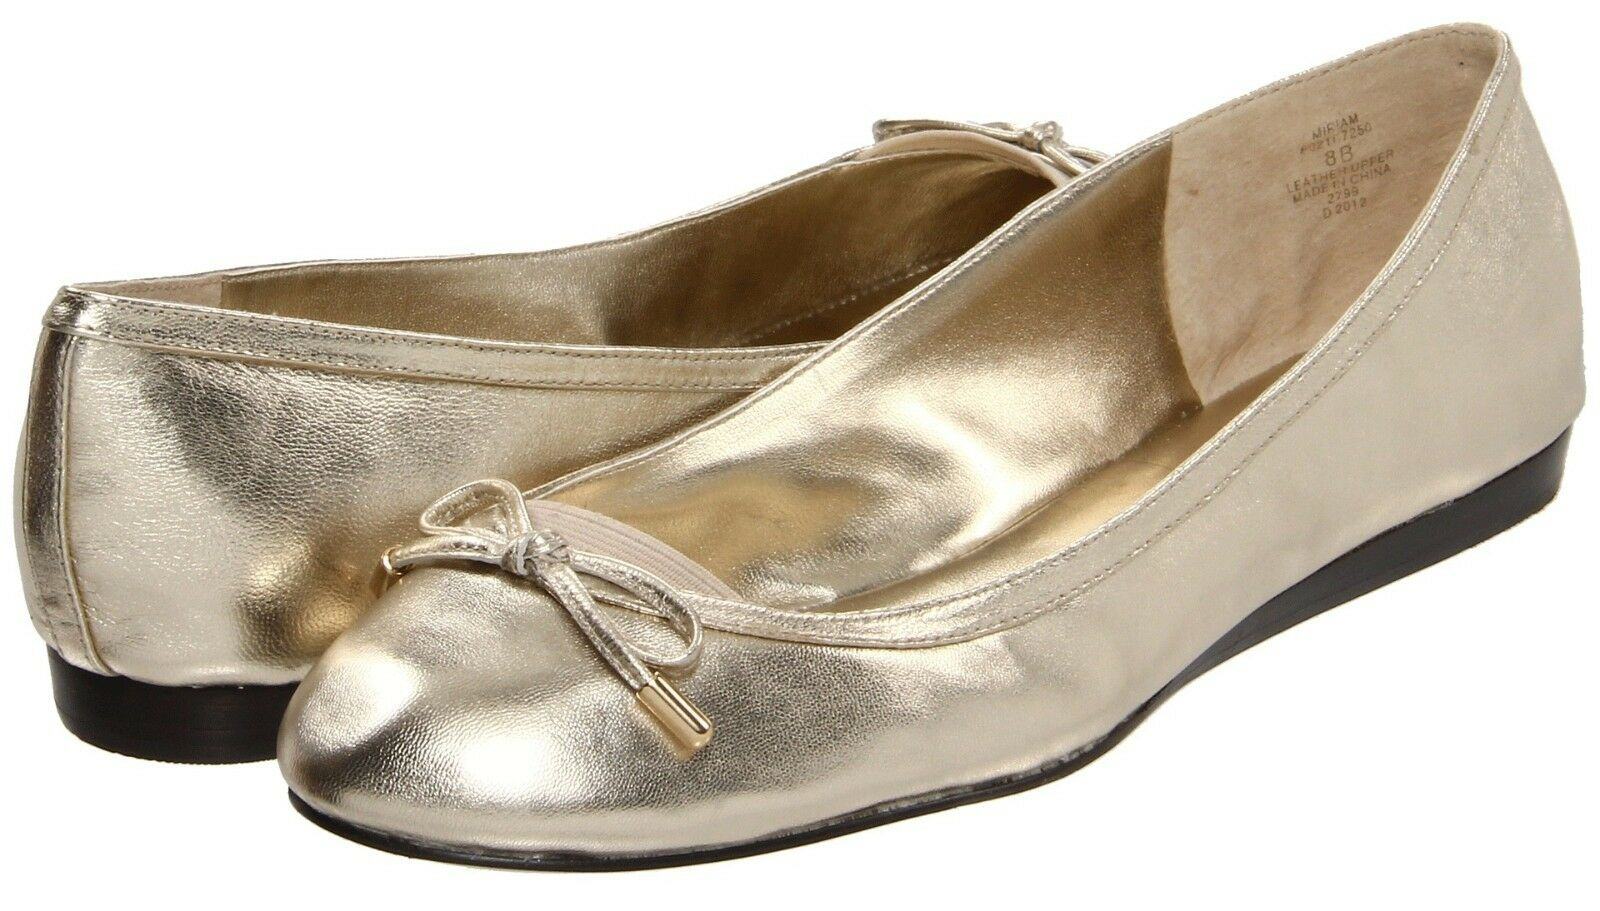 New Lauren Ralph Lauren MIRIAM Leather Flat Bow Ballet Slip-On Moc Flat Leather ~Gold *6 4b2c06